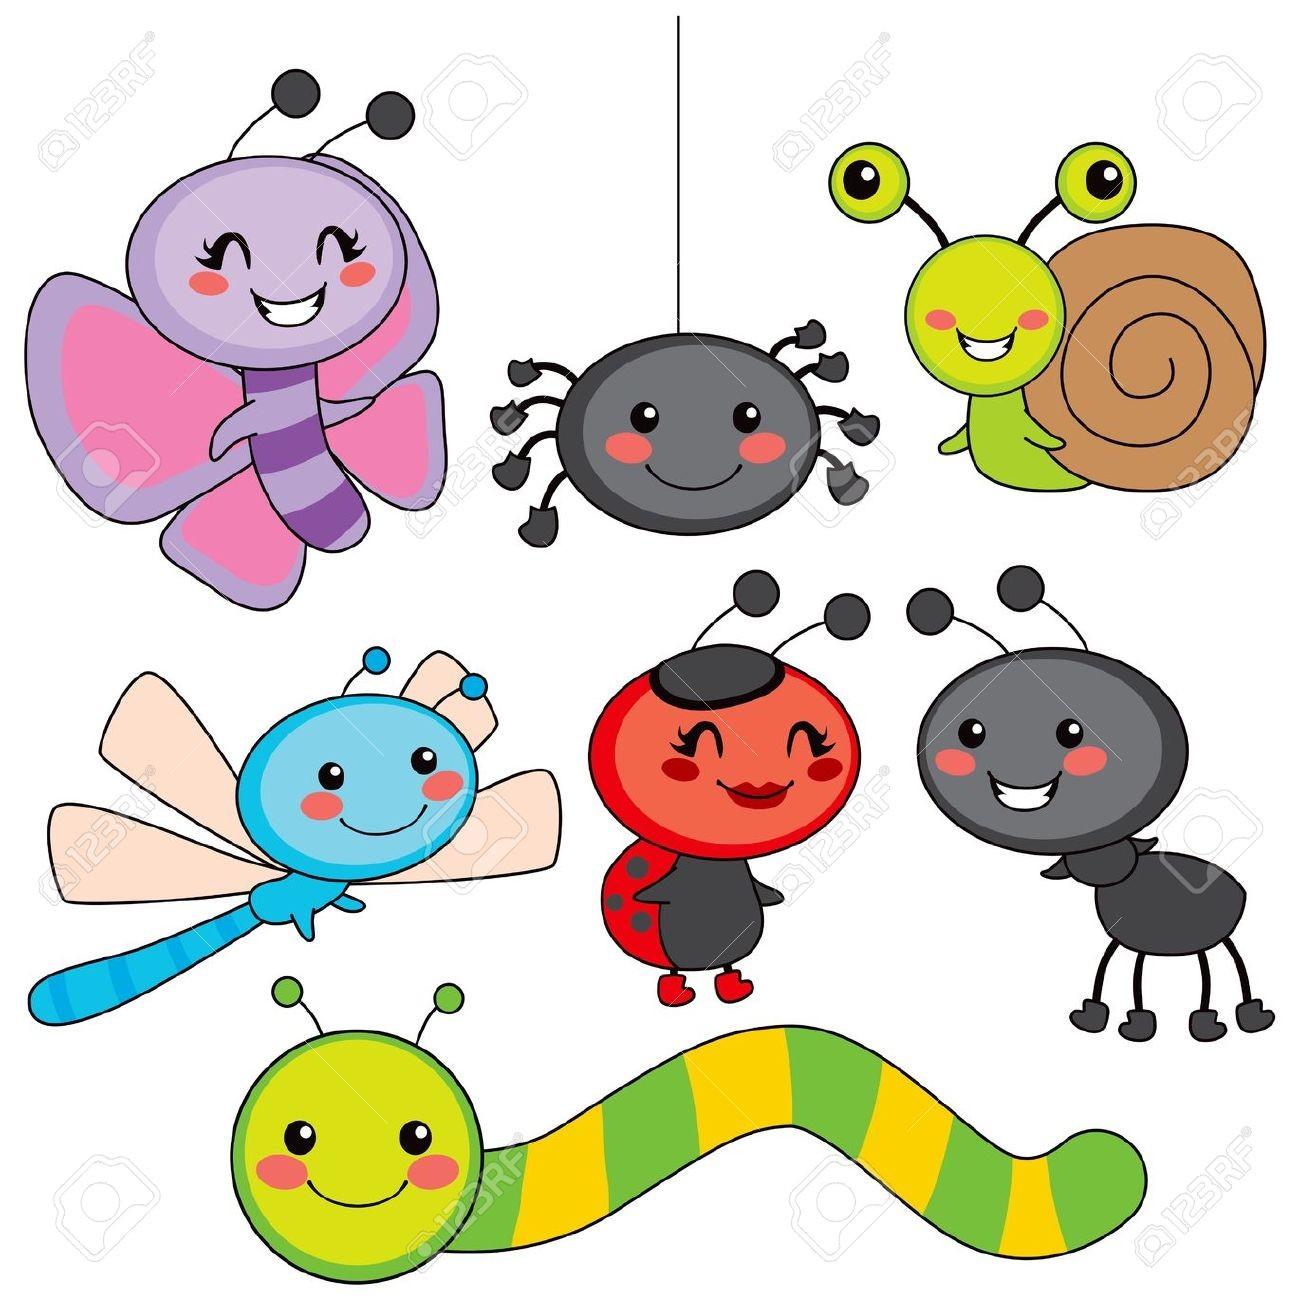 X free clip art. Bug clipart popular